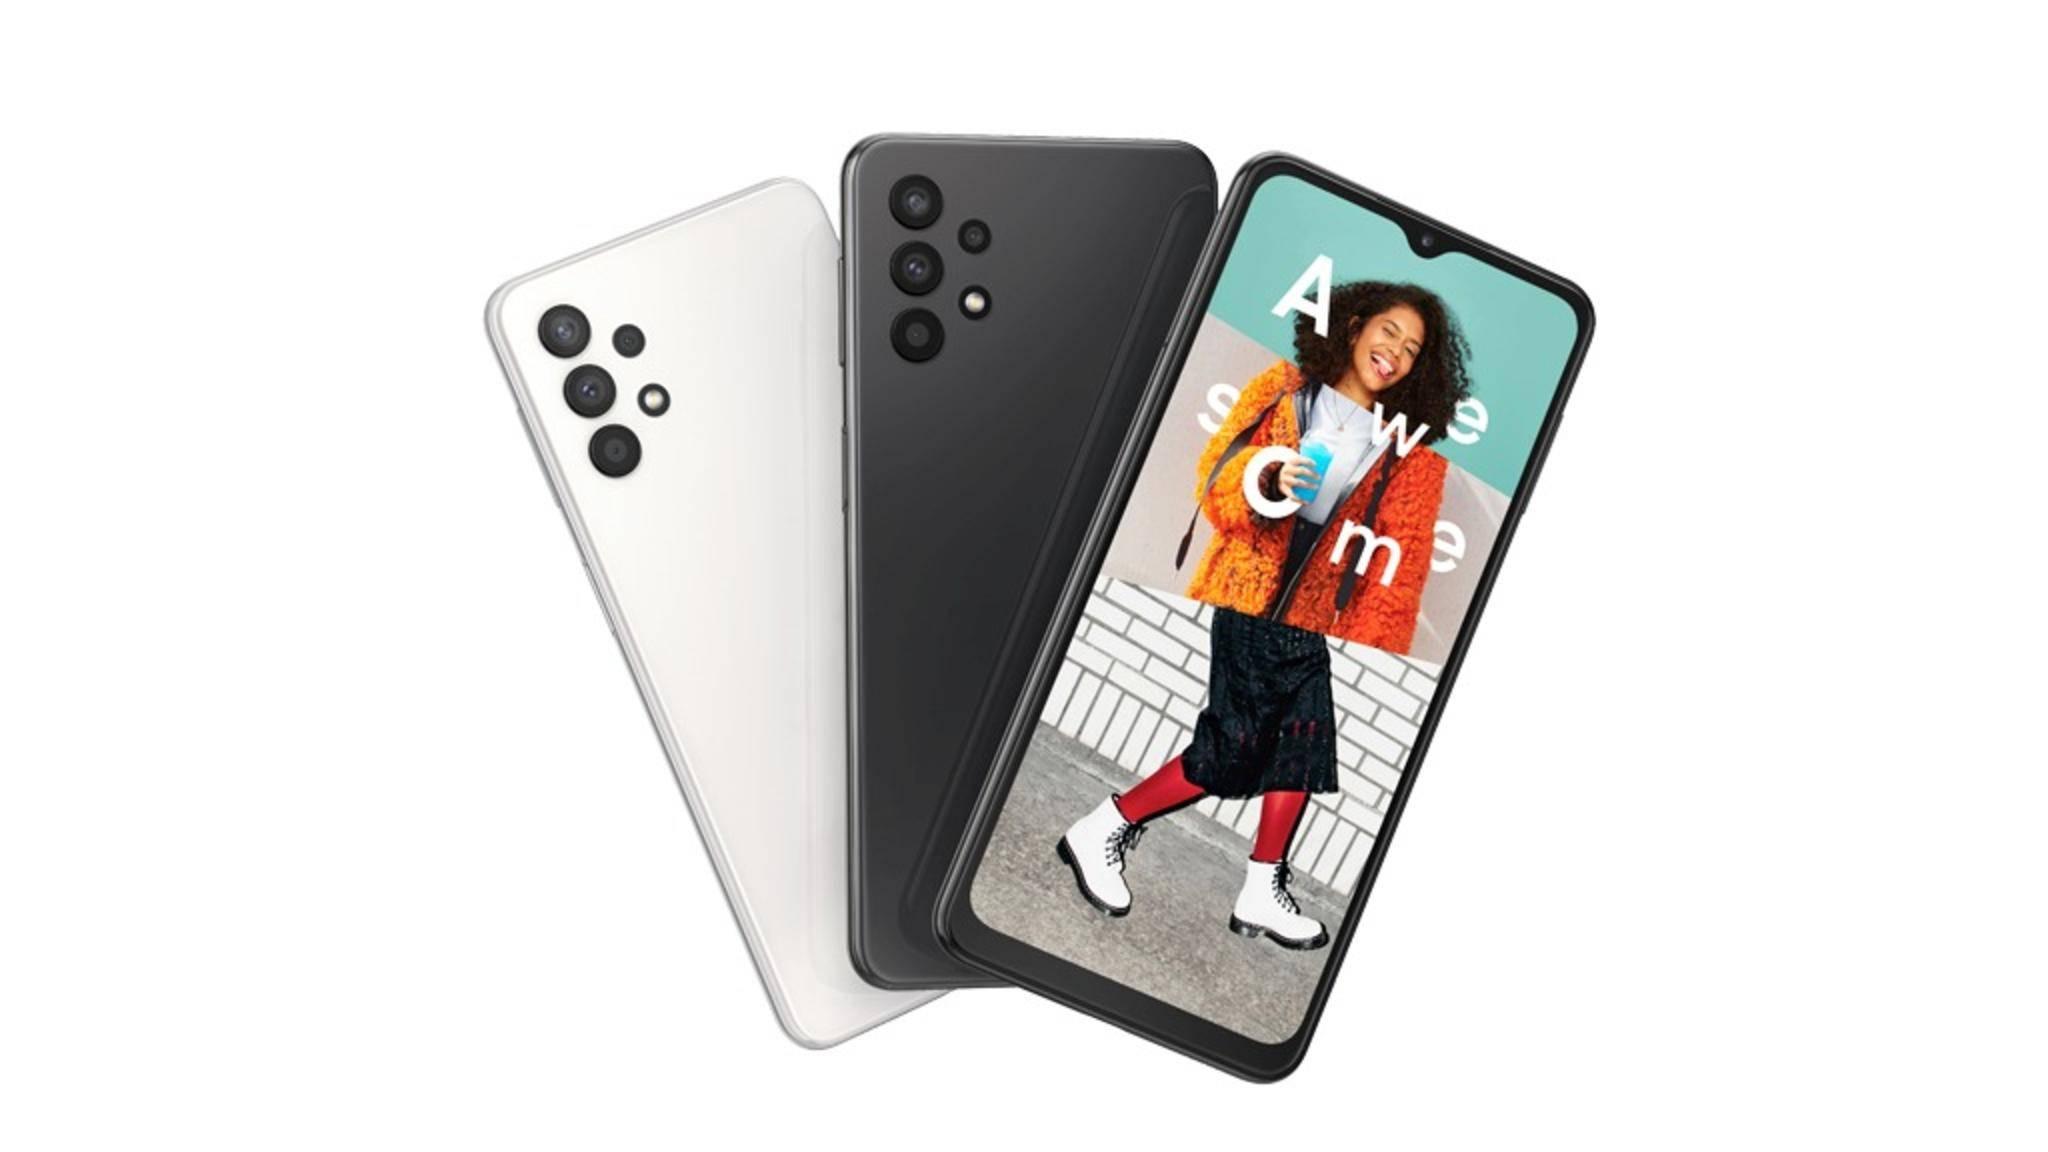 samsung-galaxy-a32-5g-smartphone